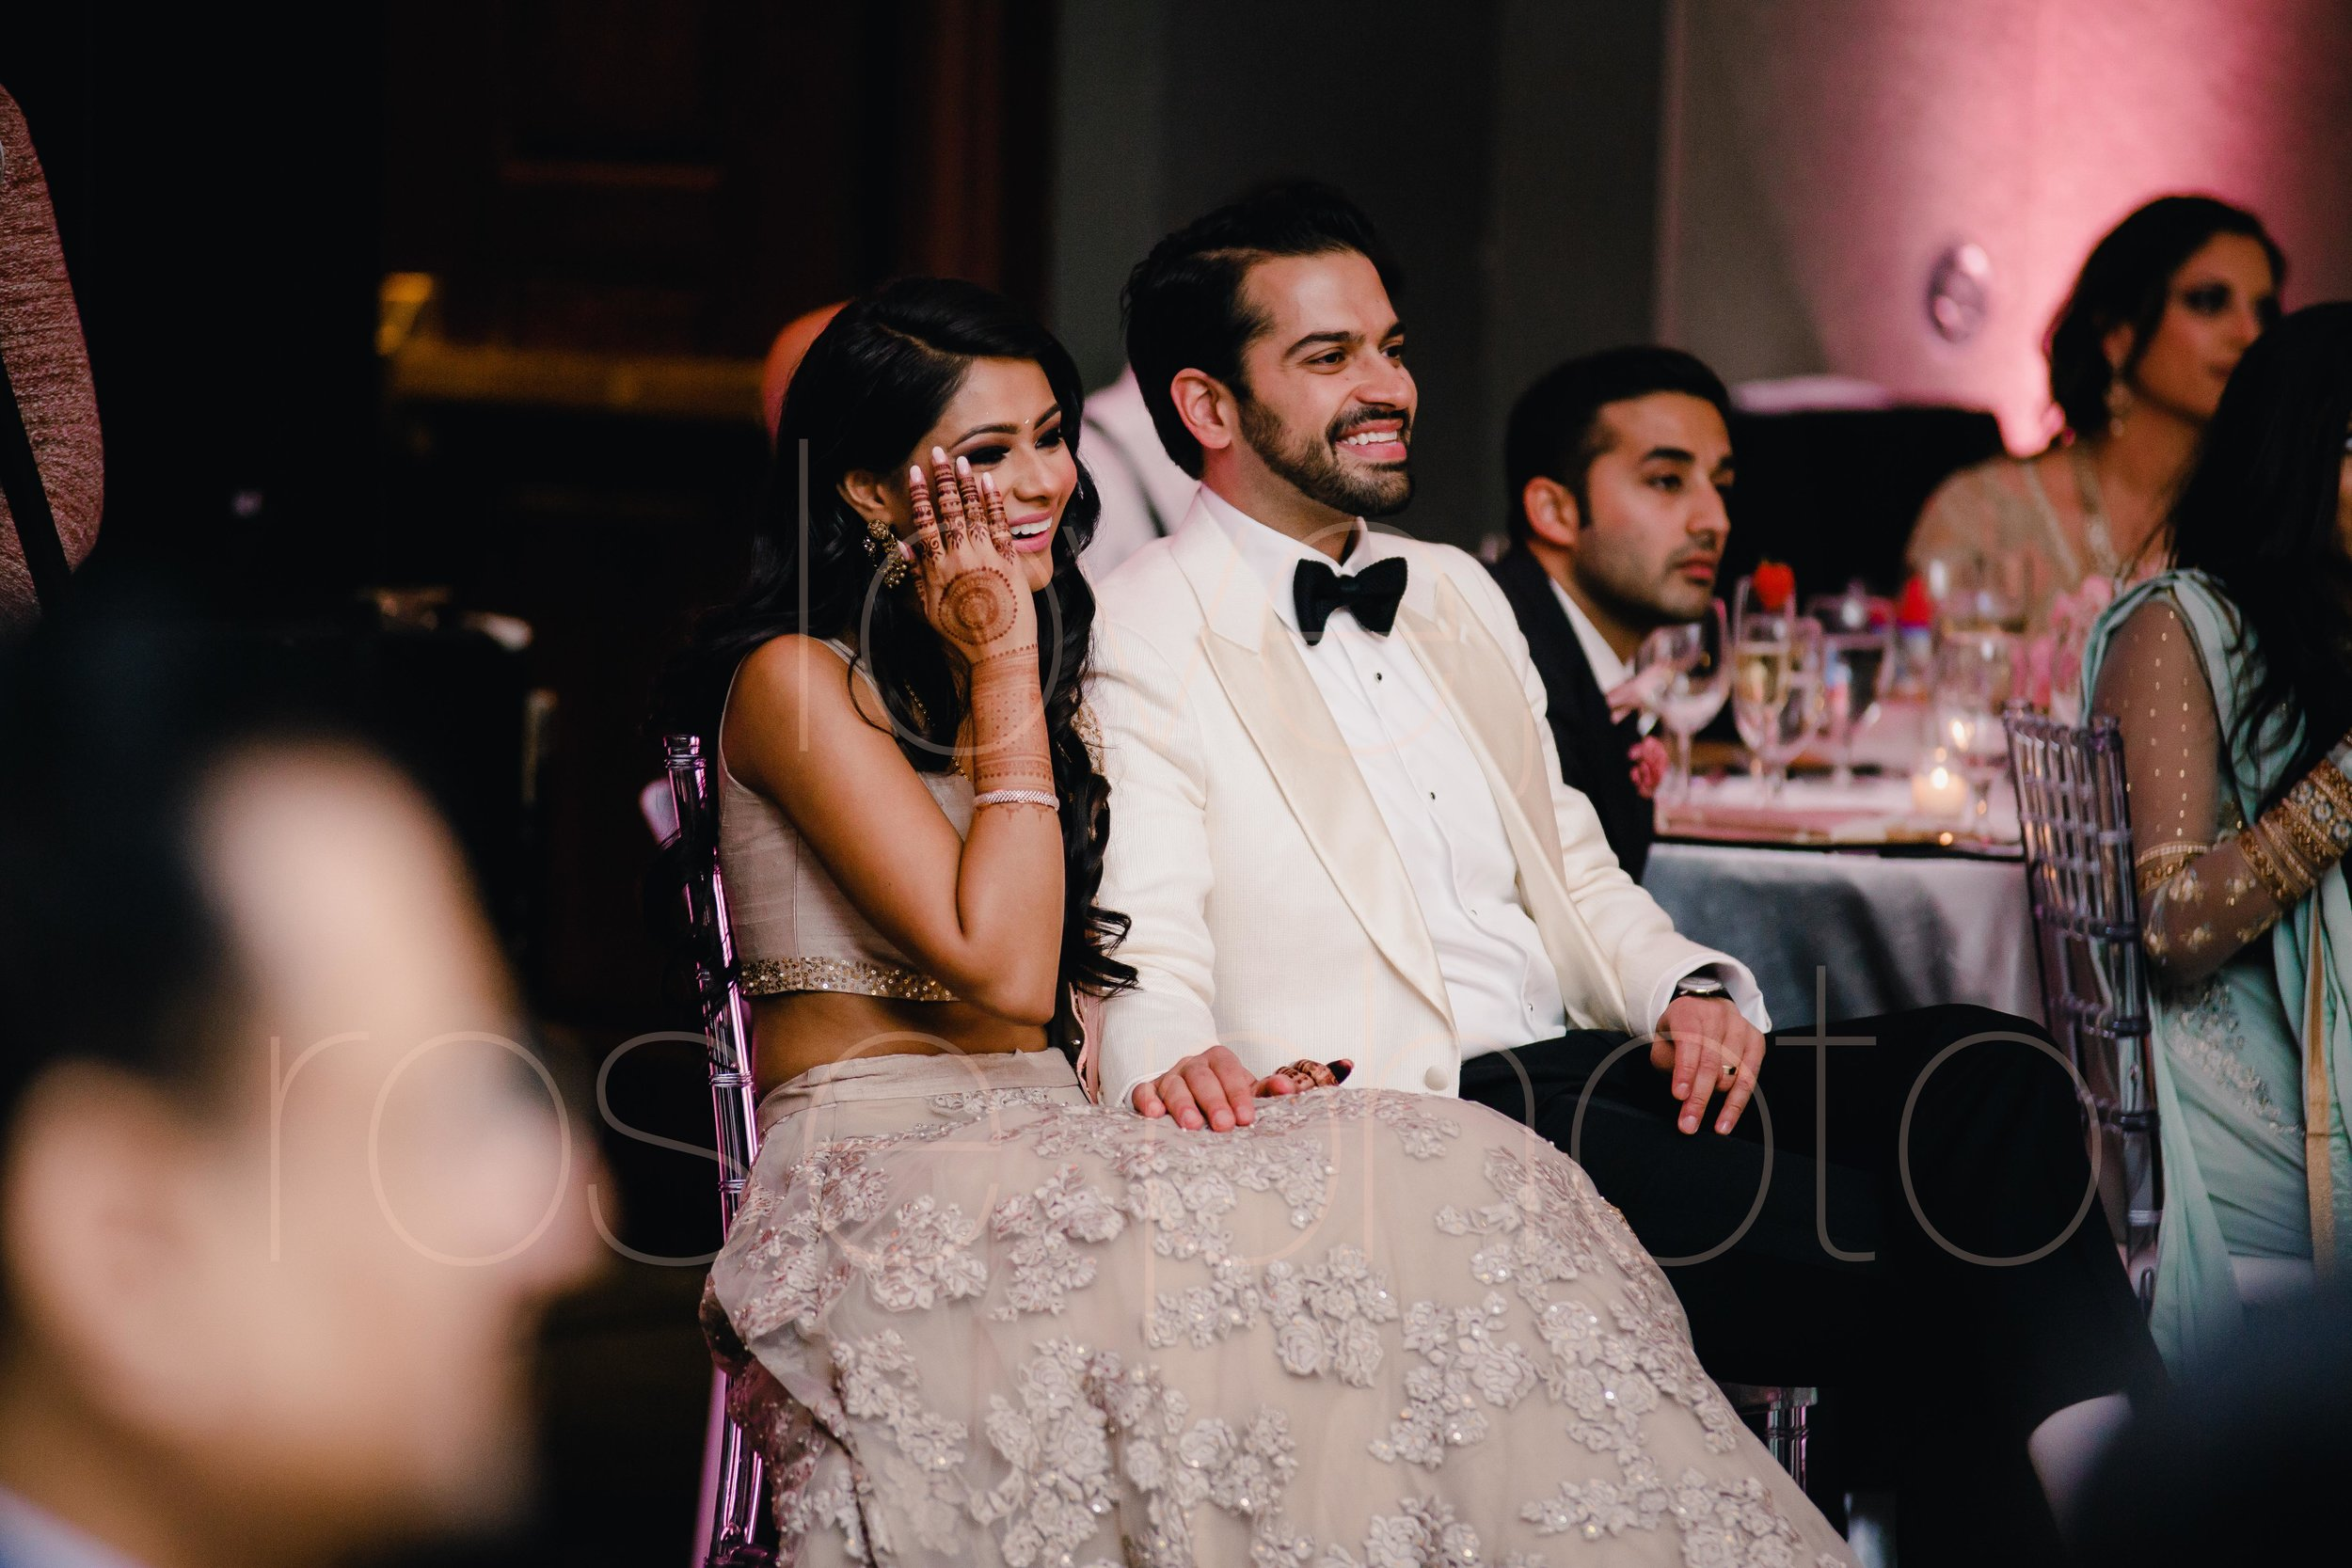 Chicago Indian Wedding best photography lifestyle wedding portrait luxury wedding-67.jpg